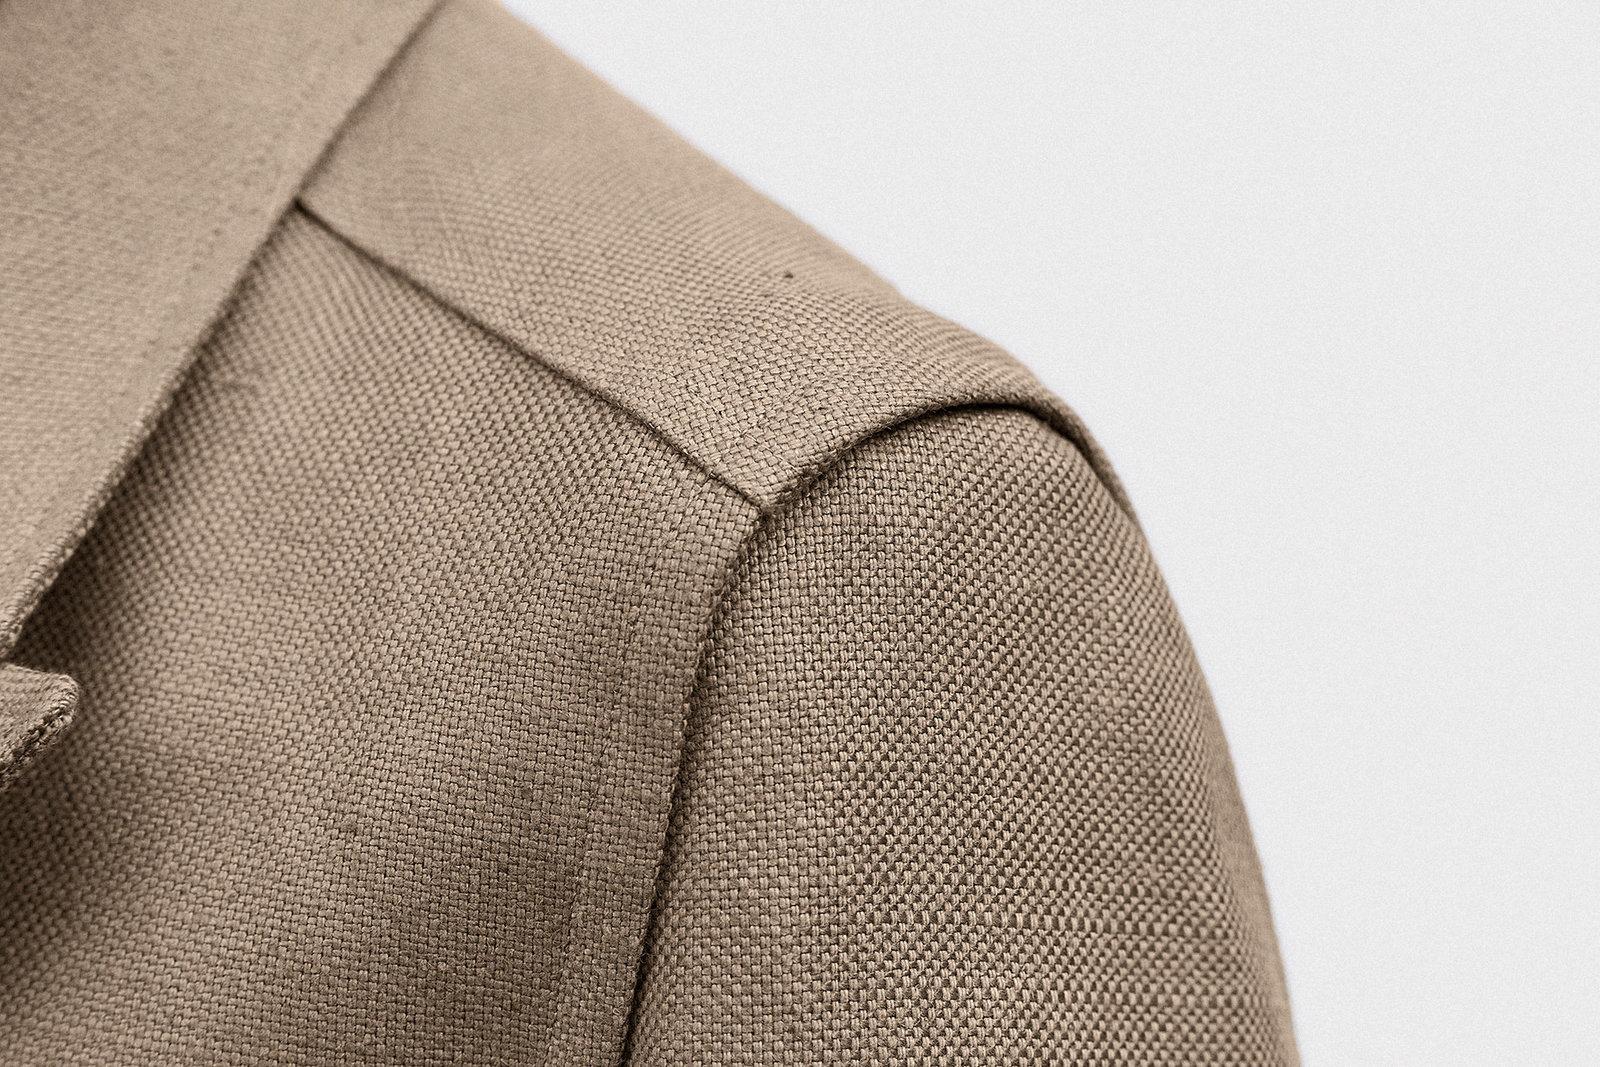 shopcoat-cotton-linen-hopsack-malt-9@2x.jpg